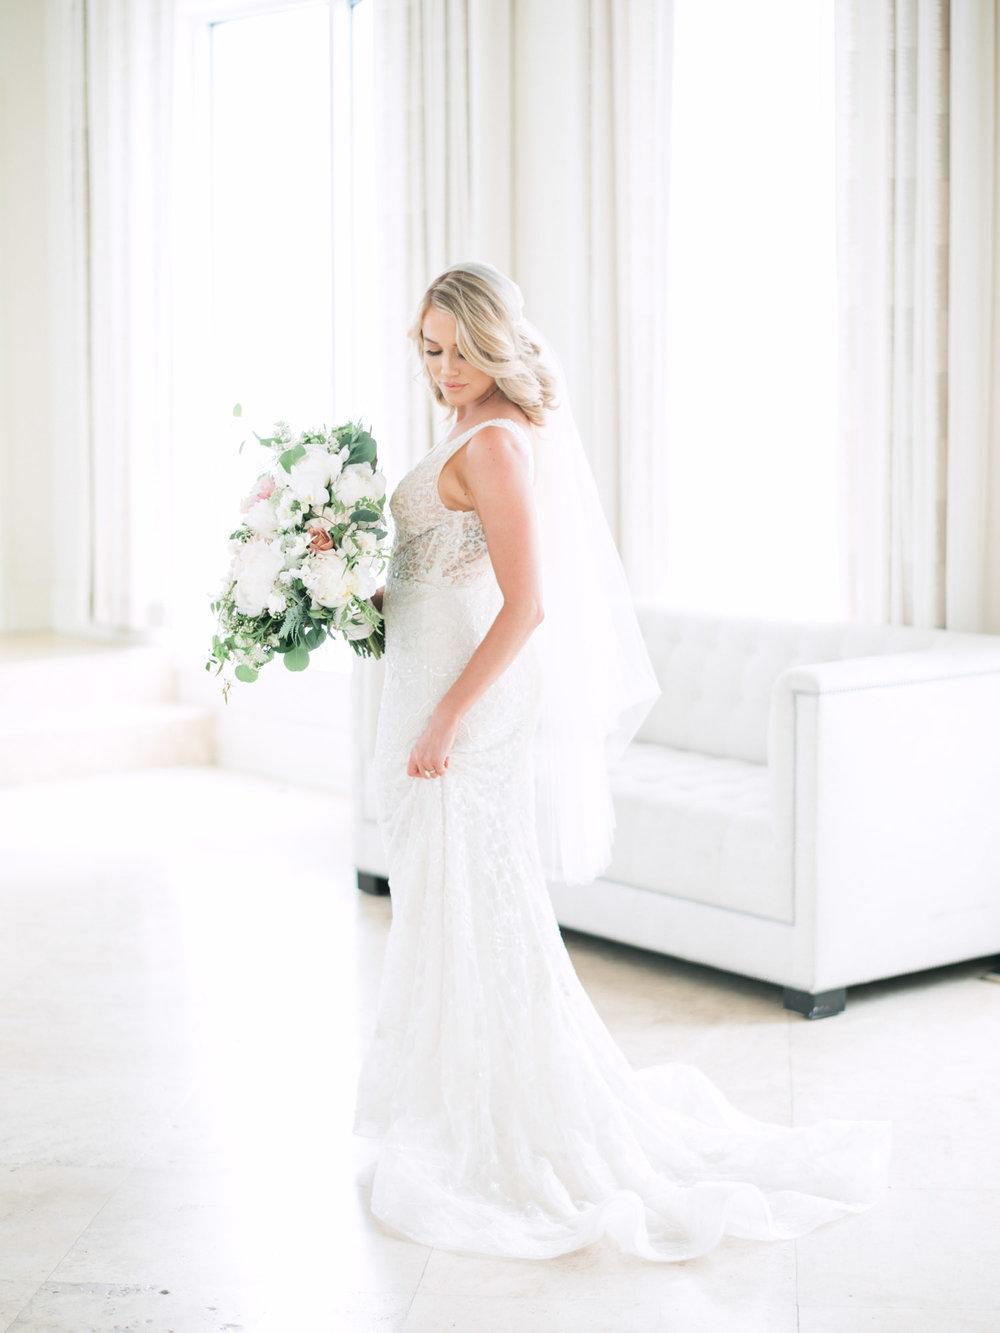 raleigh-miami-beach-destination-film-wedding-0701.jpg